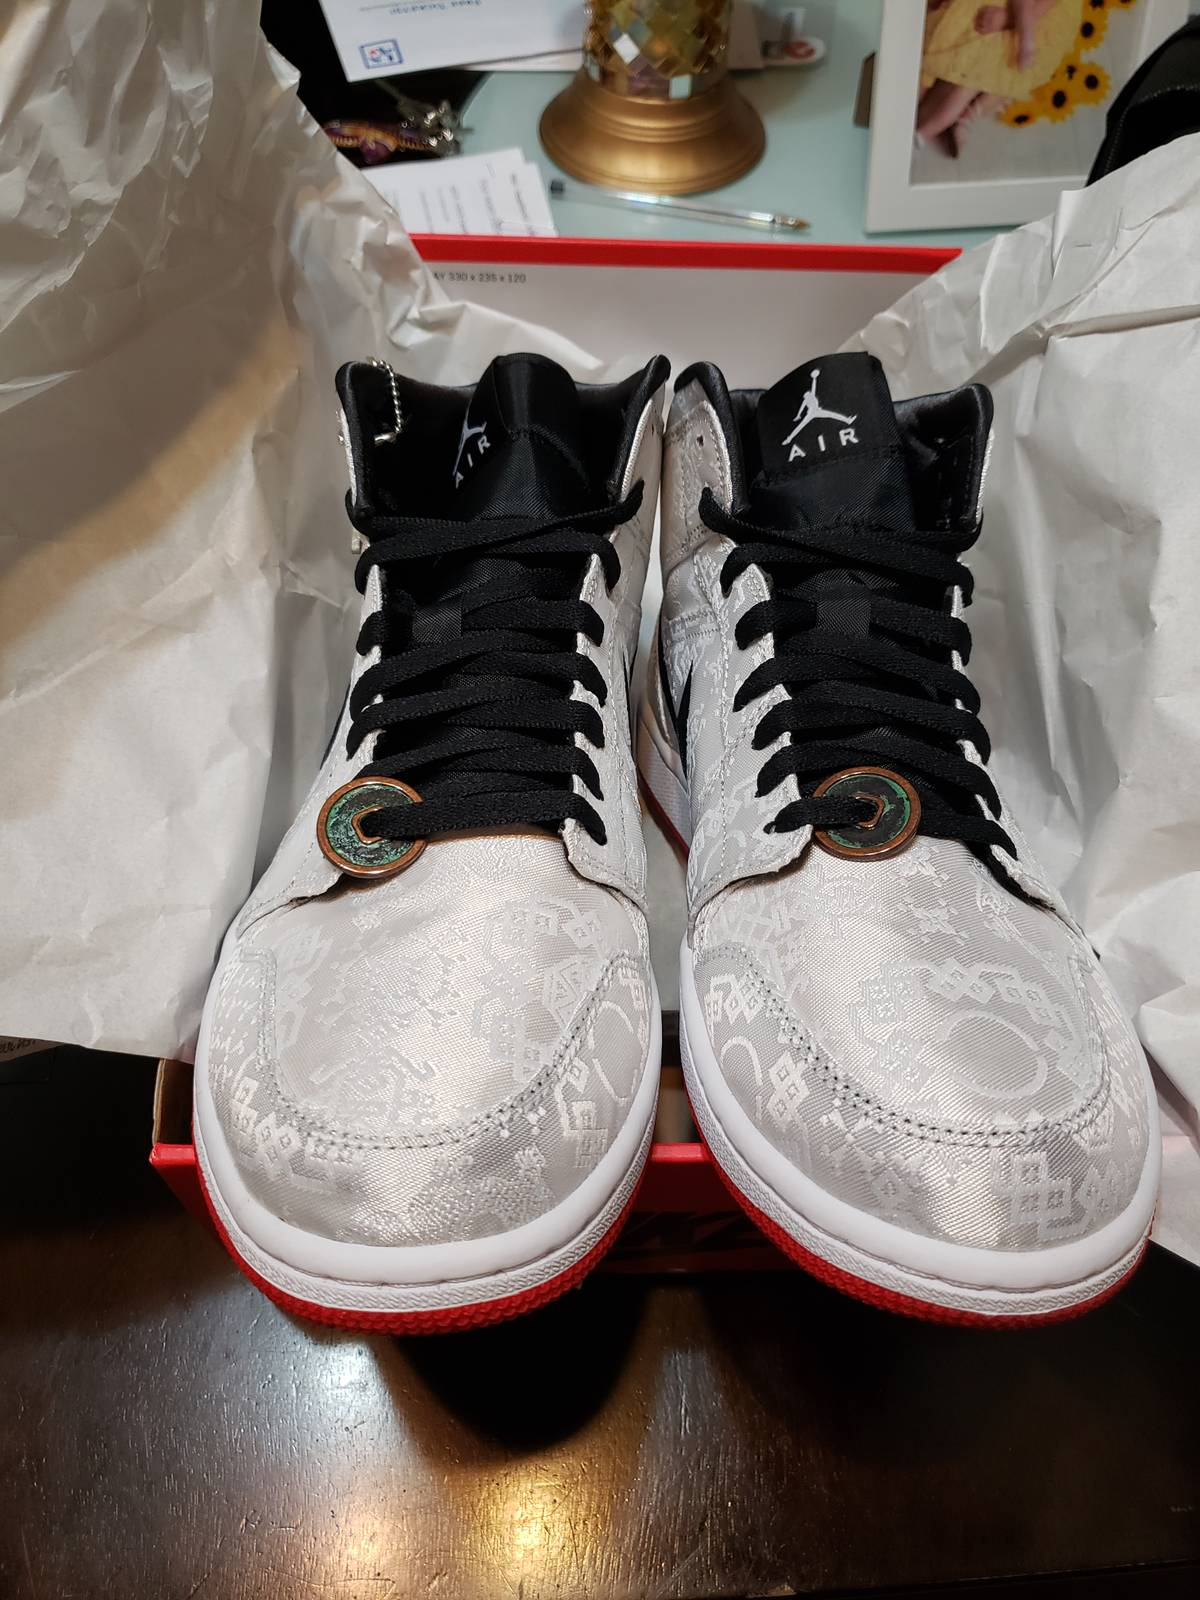 Clot × Jordan Brand × Nike Air Jordan 1 Mid Se Frls Gc Size 10.5 $424